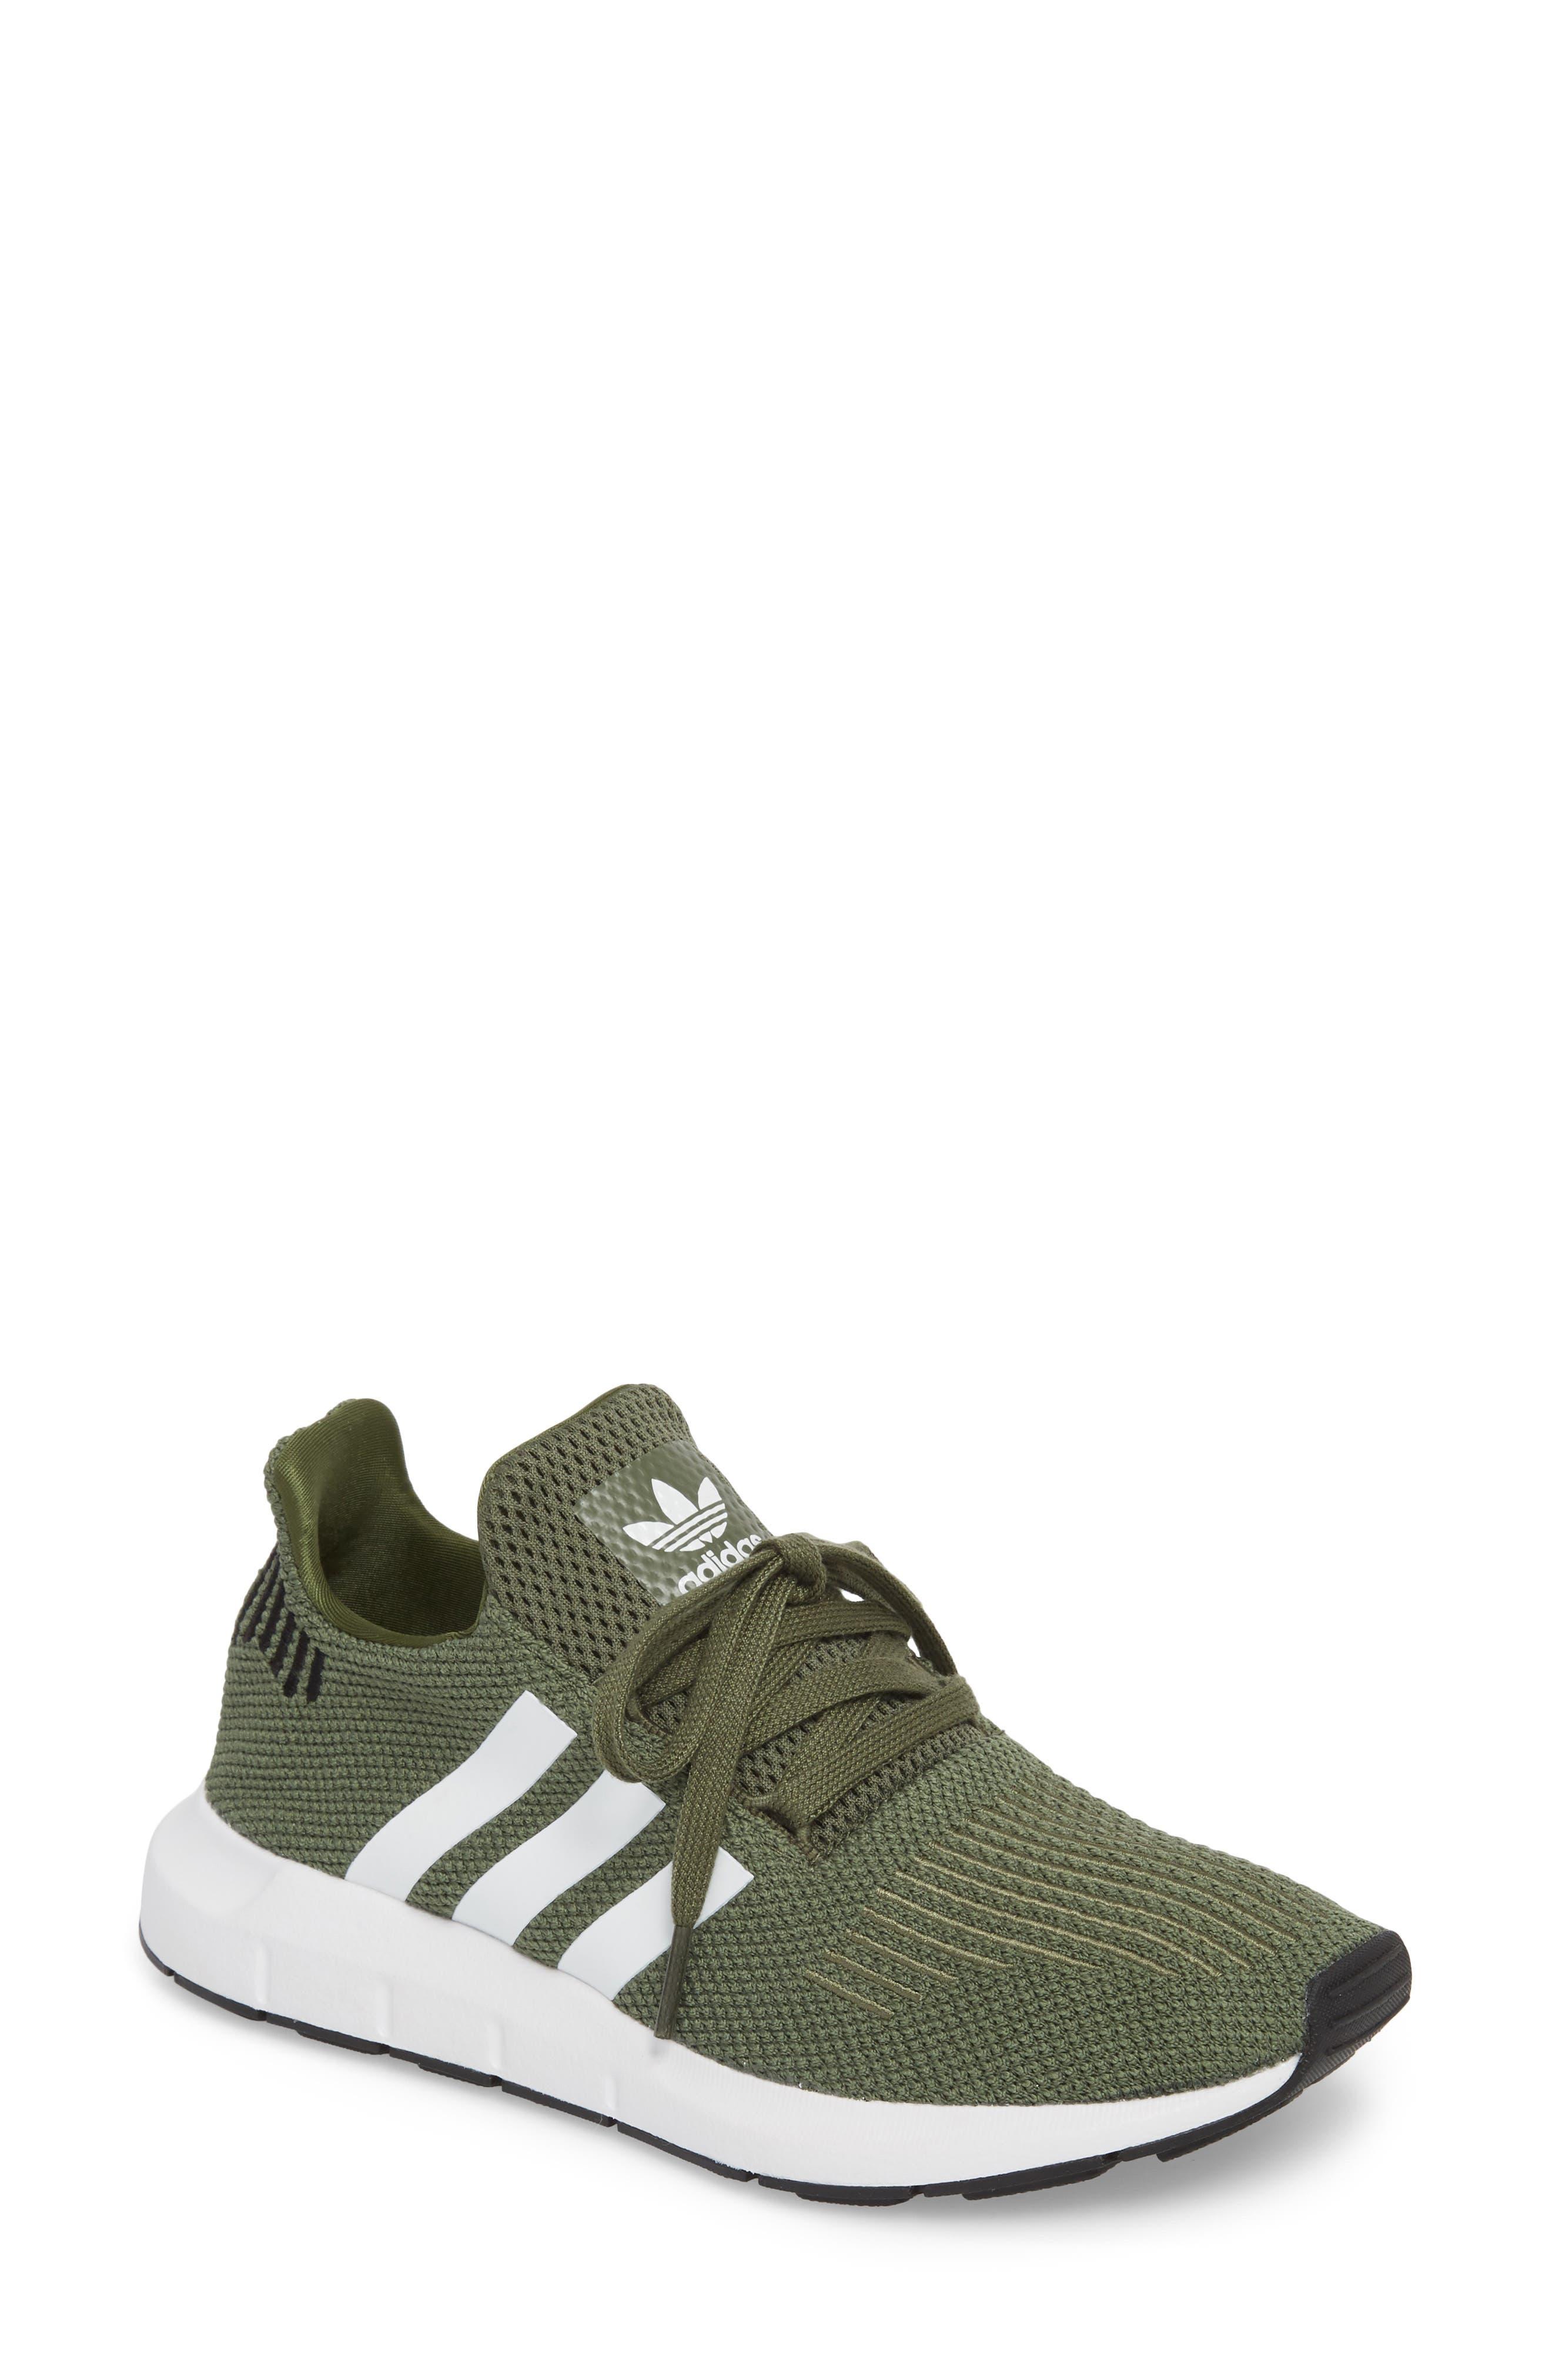 Swift Run Sneaker,                         Main,                         color, Base Green/ White/ Black